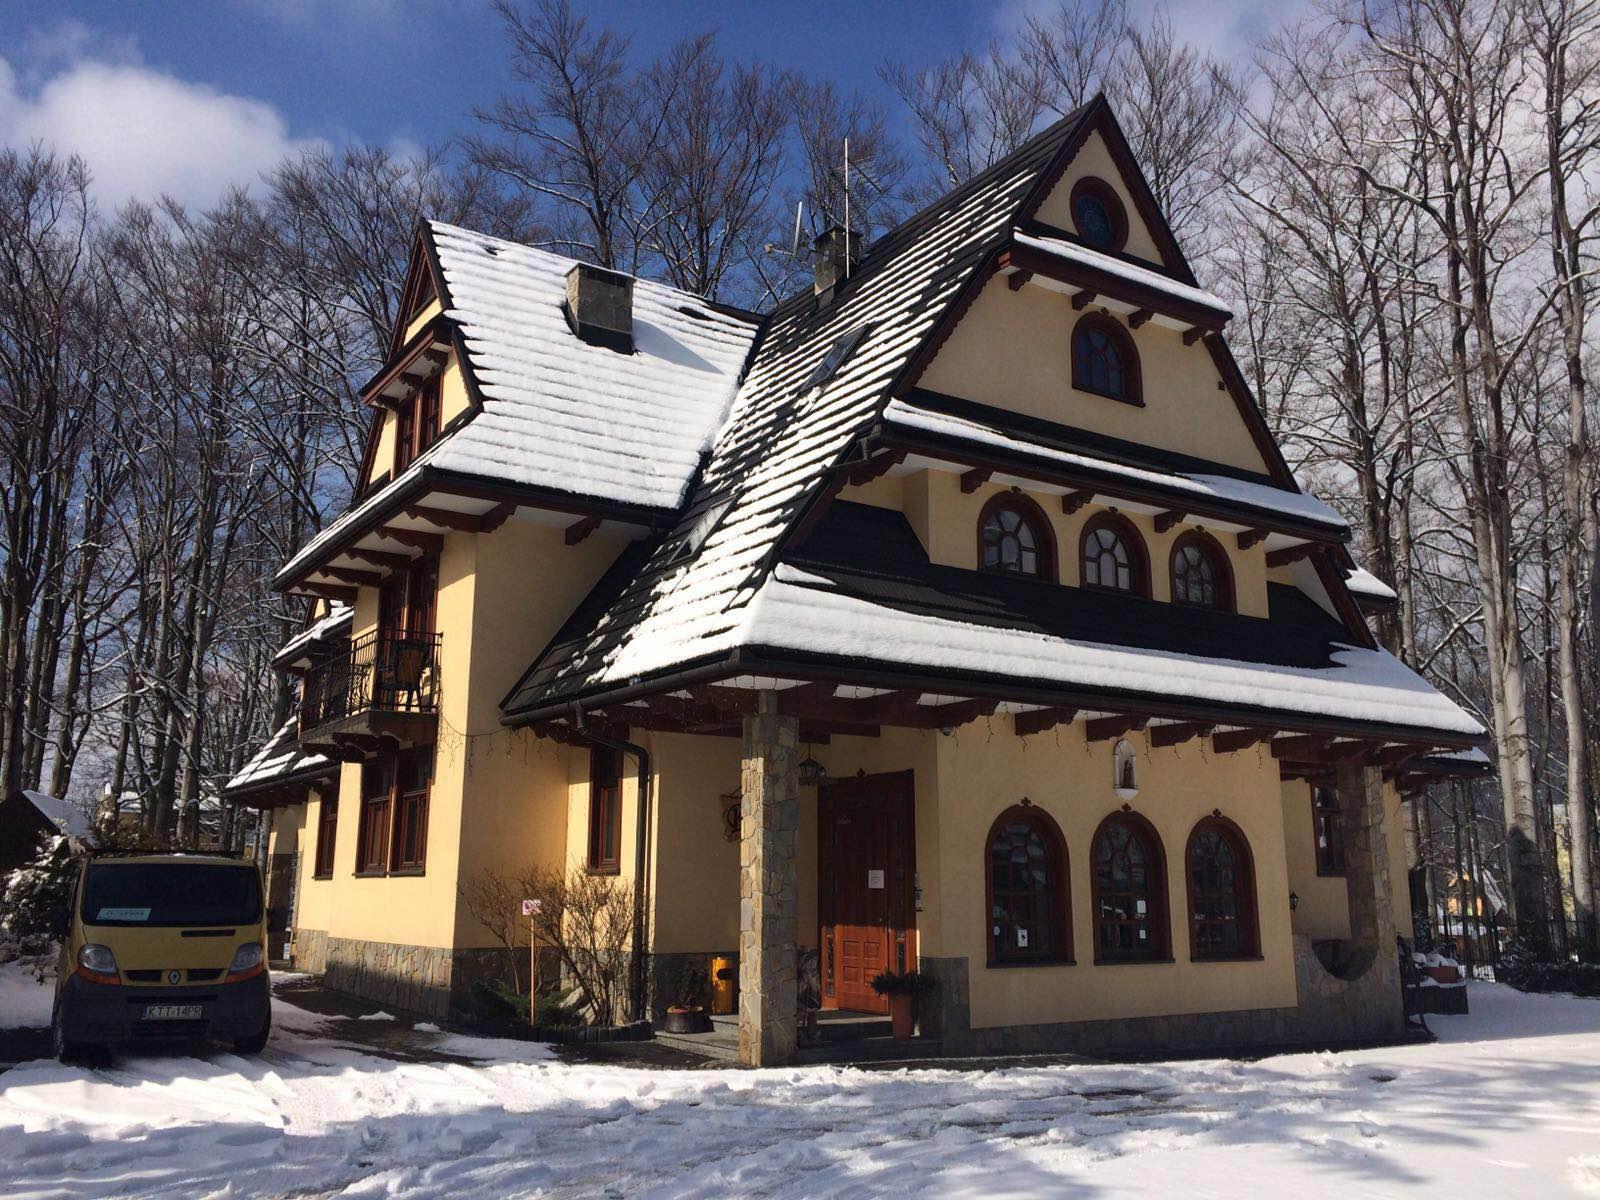 White Side Holidays Poland, Willa Bor Ski Accommodation, Zakopane